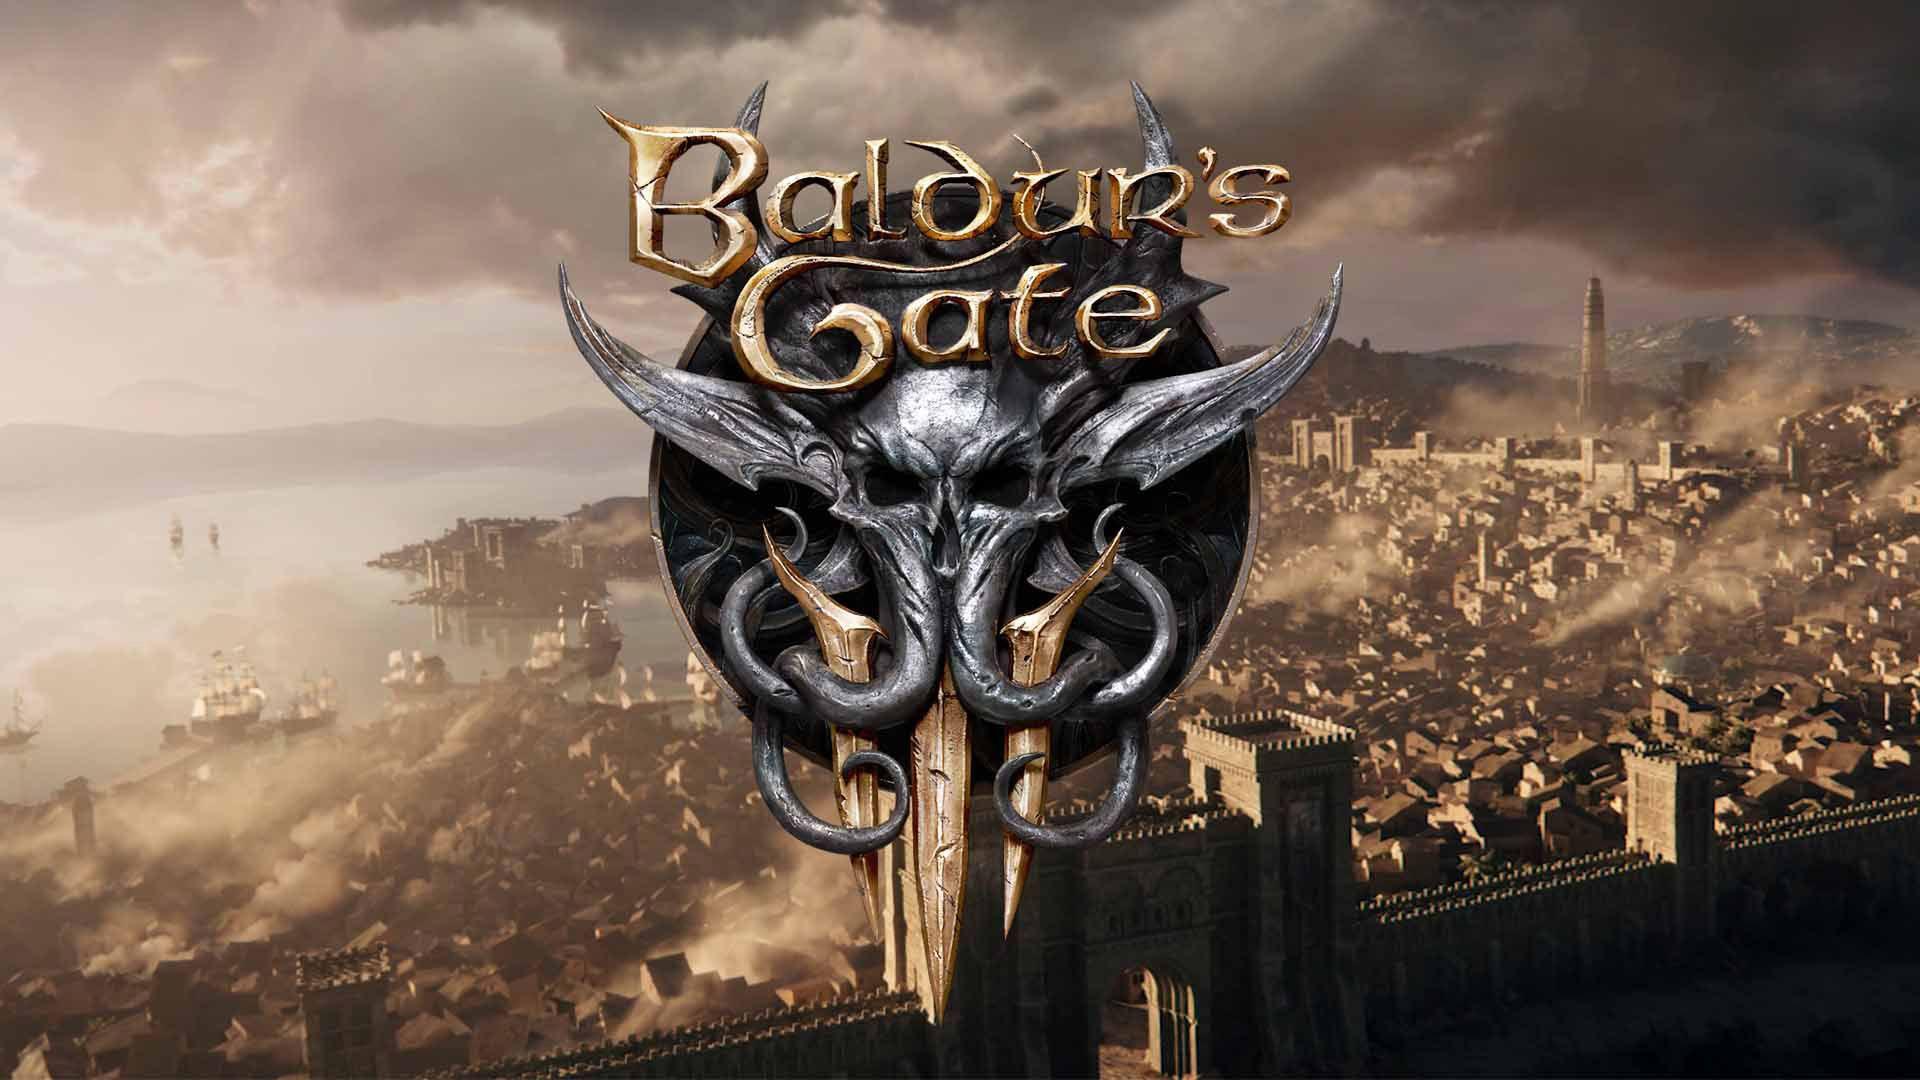 Free Baldur's Gate III Wallpaper in 1920x1080